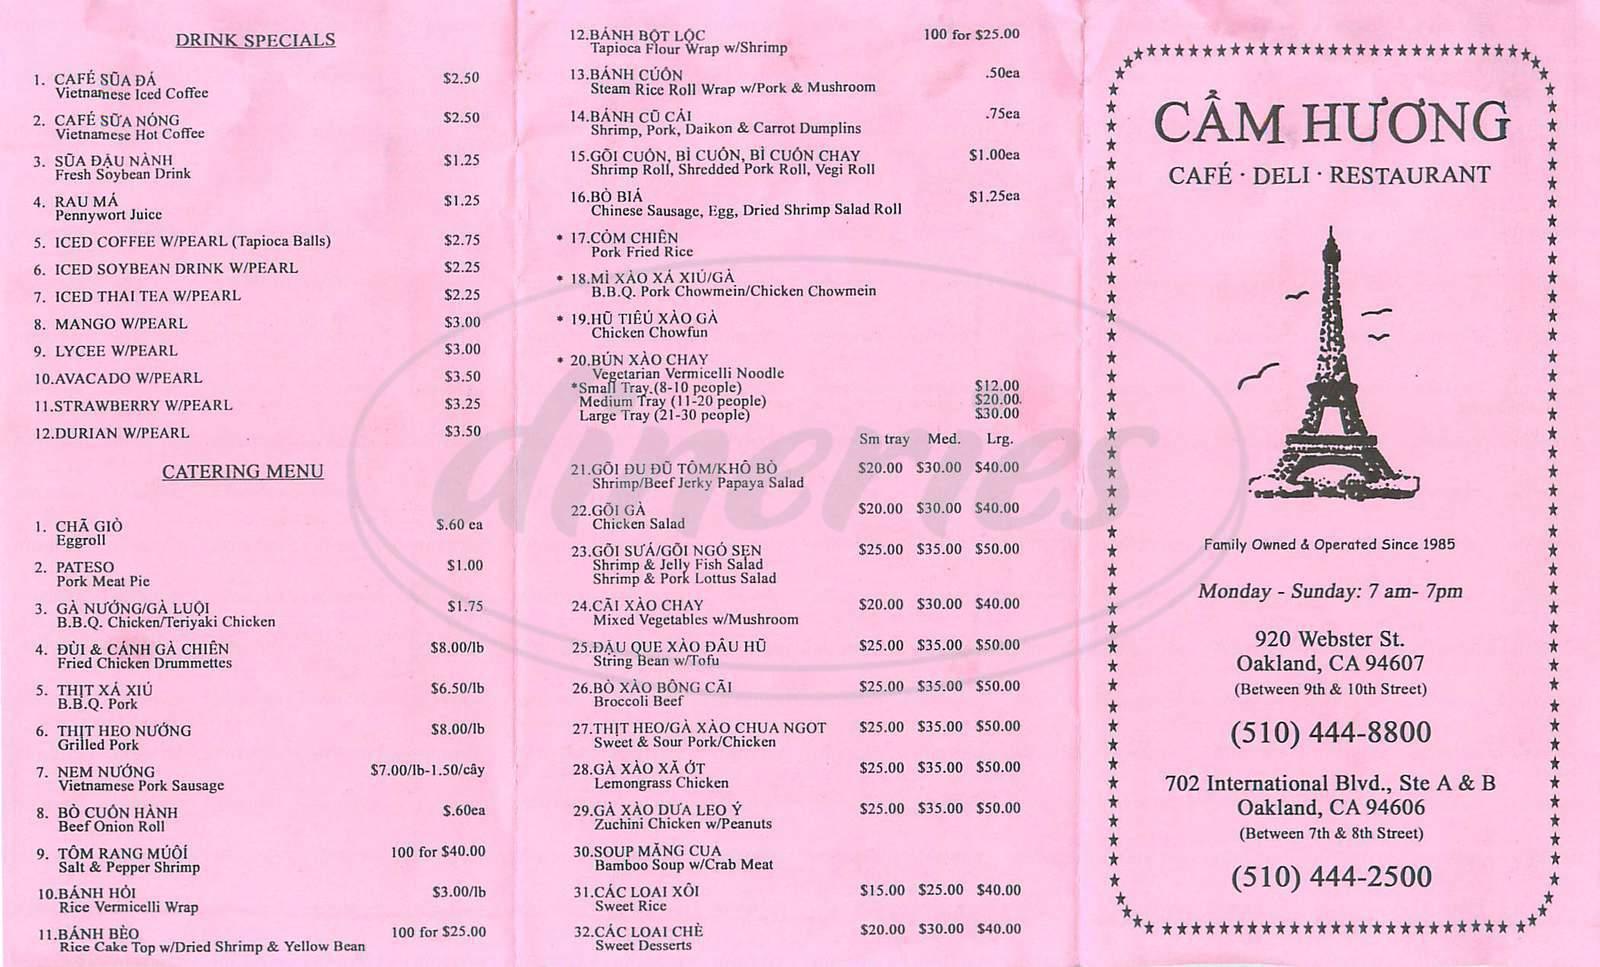 menu for Cam Huong